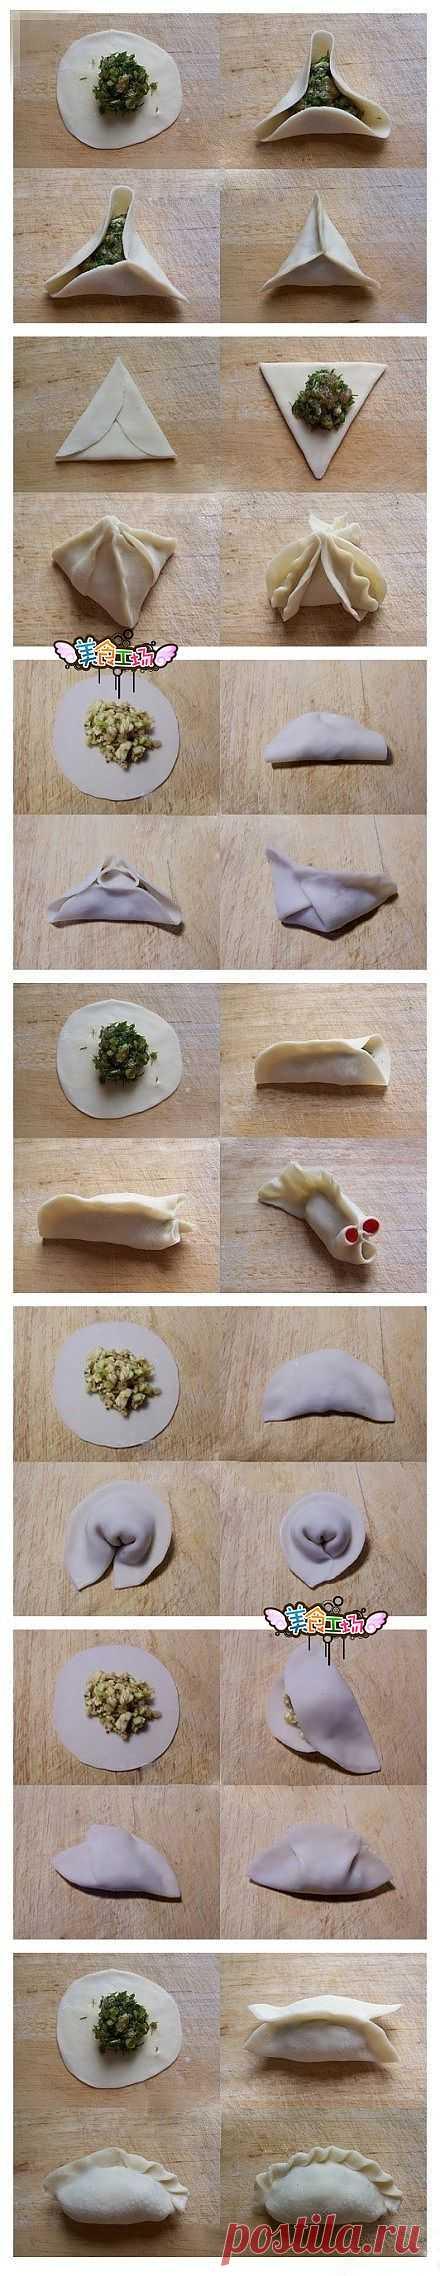 We mold pelmeni! Options much... Choose!.